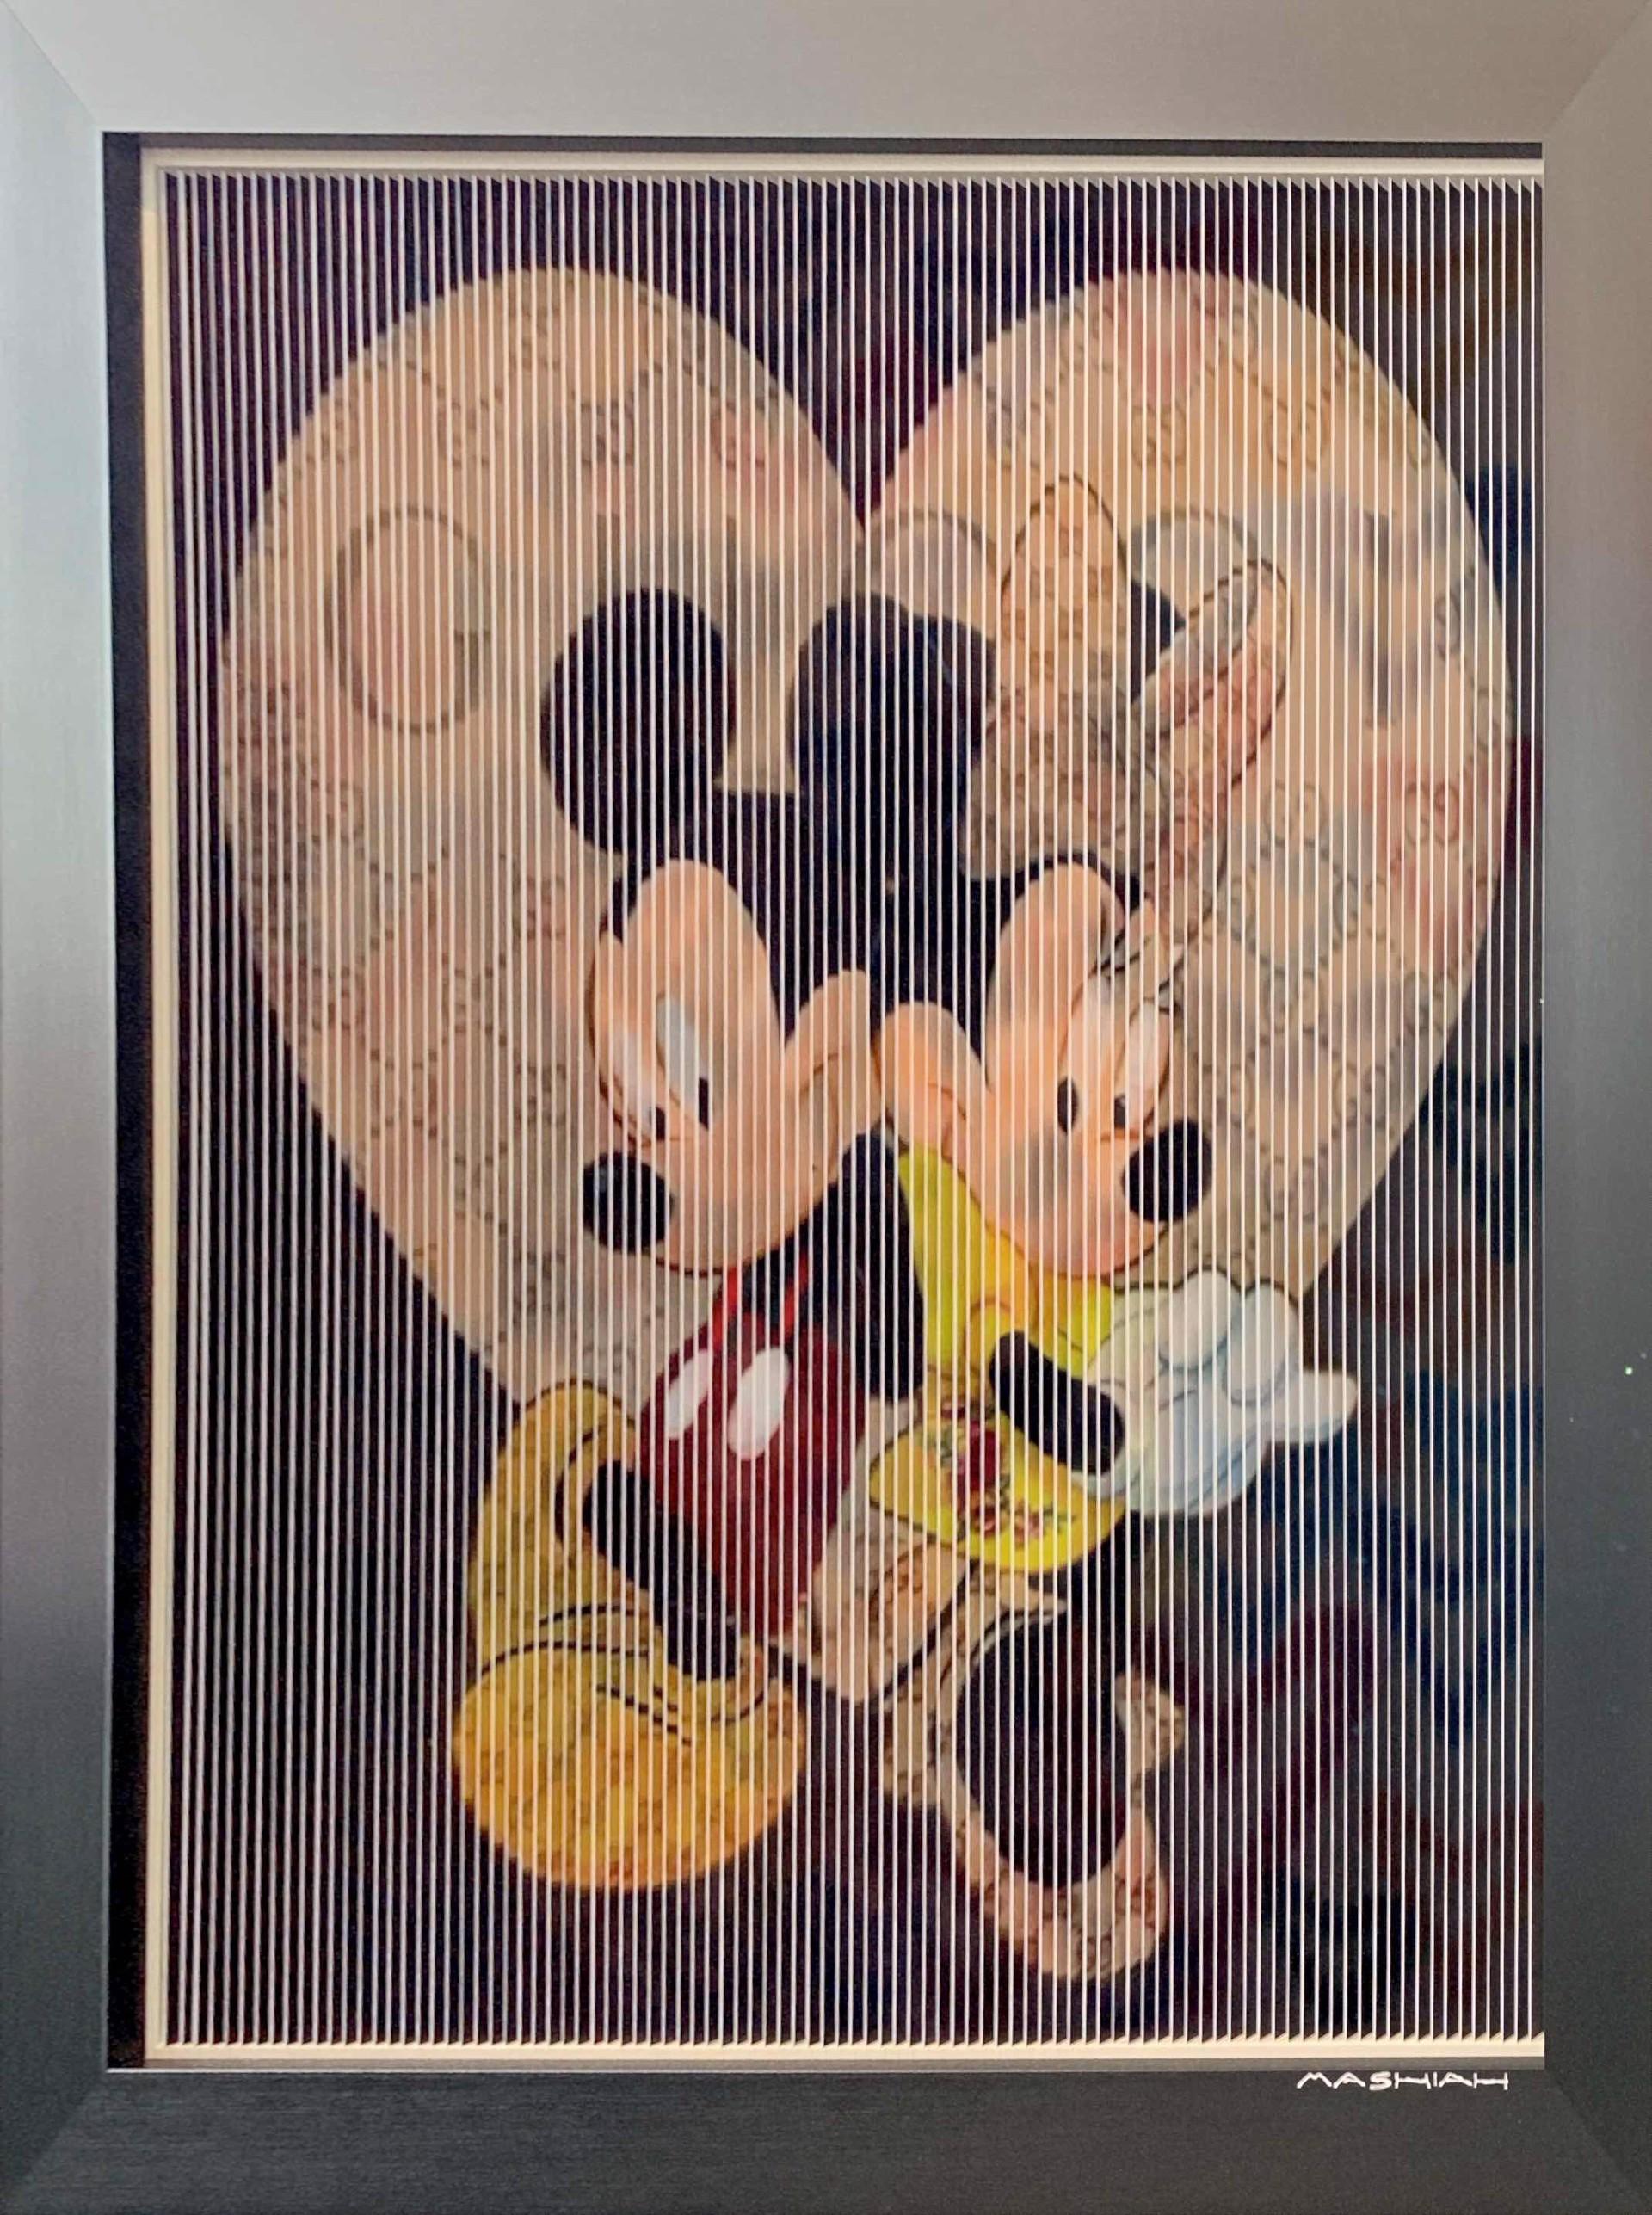 I Love You - Mickey & Minnie by Efi Mashiah